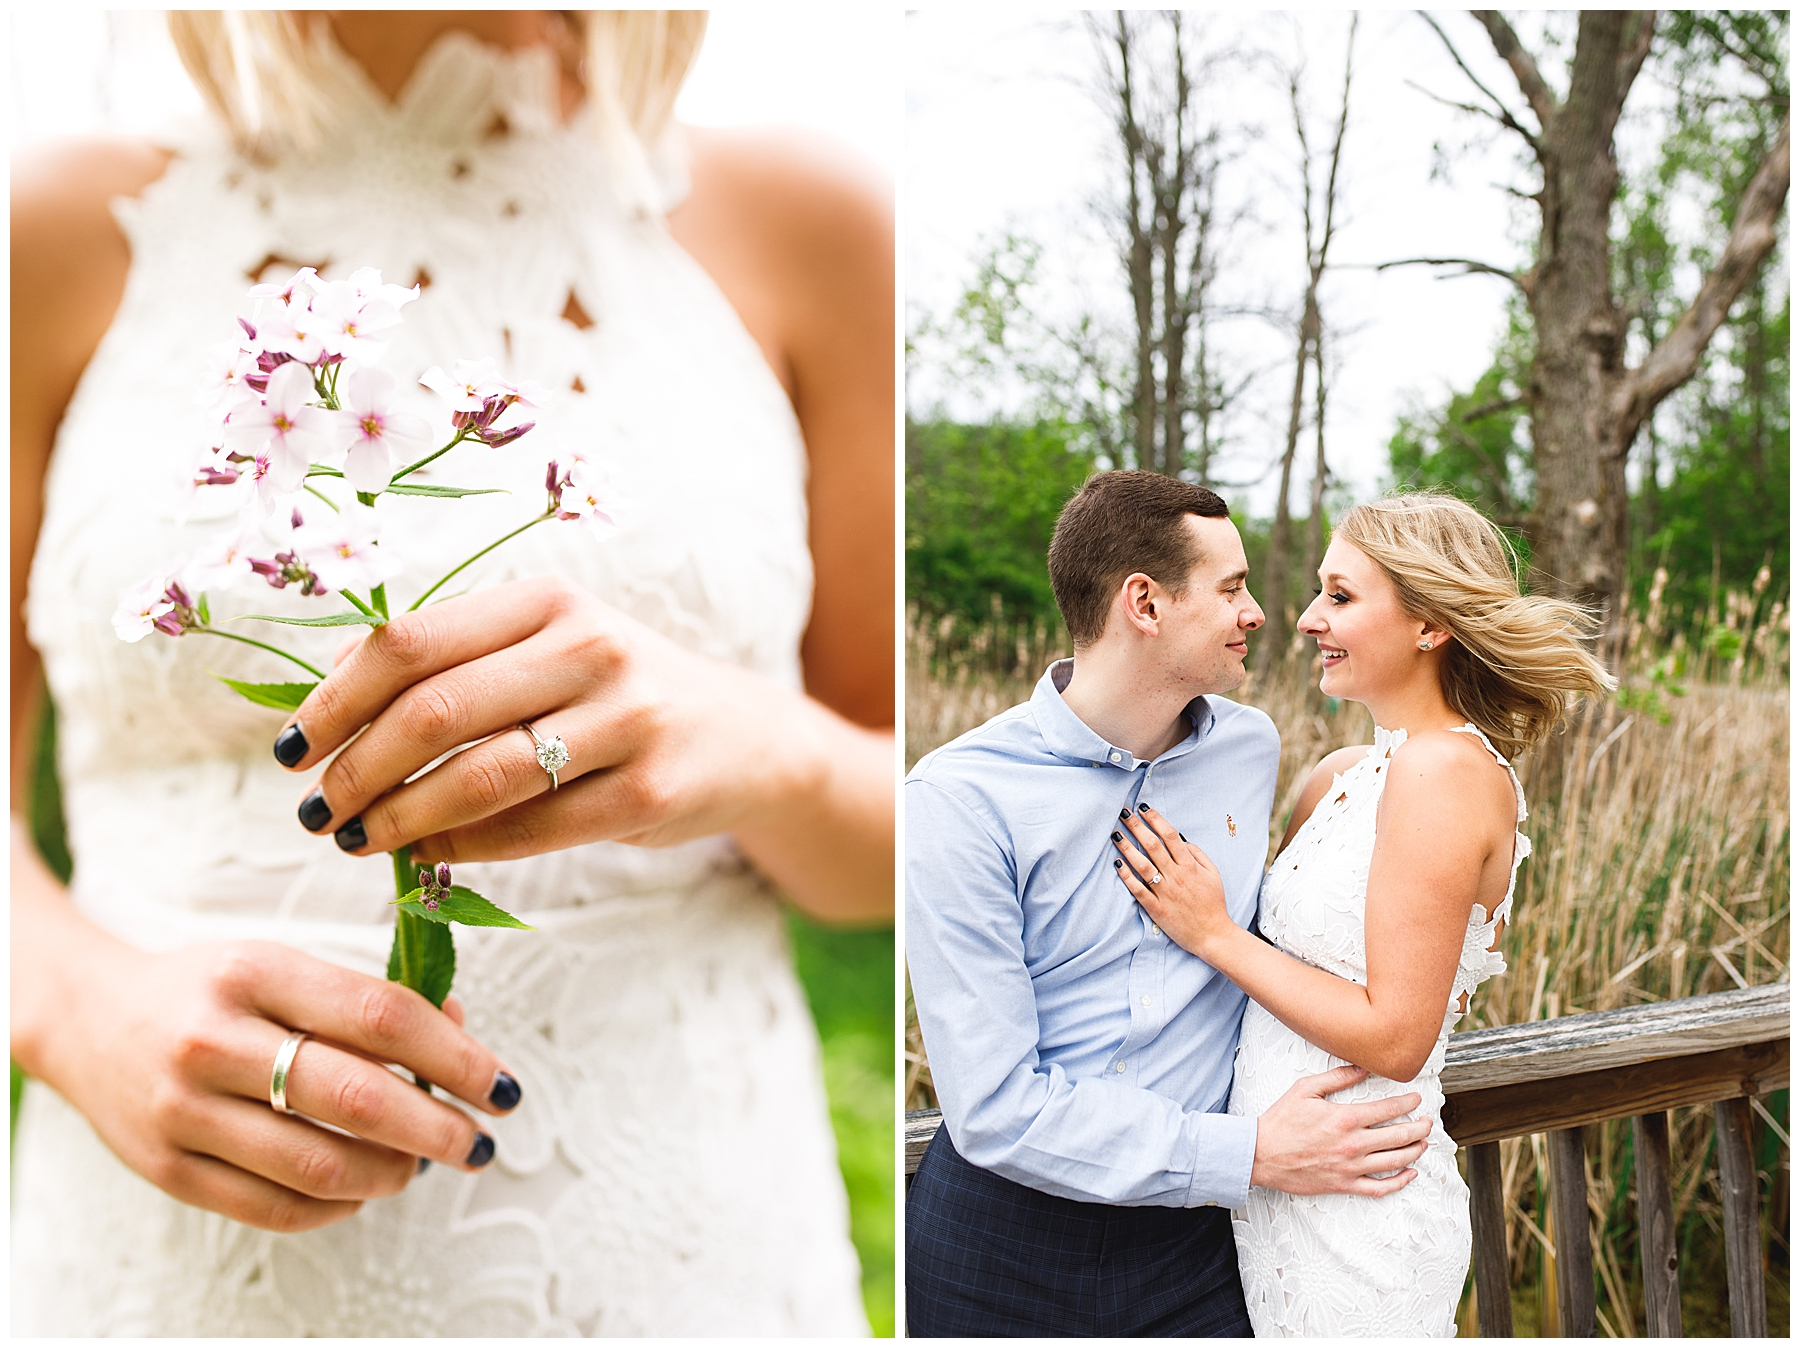 Hannah + Ben Engaged Milwaukee_0003.jpg